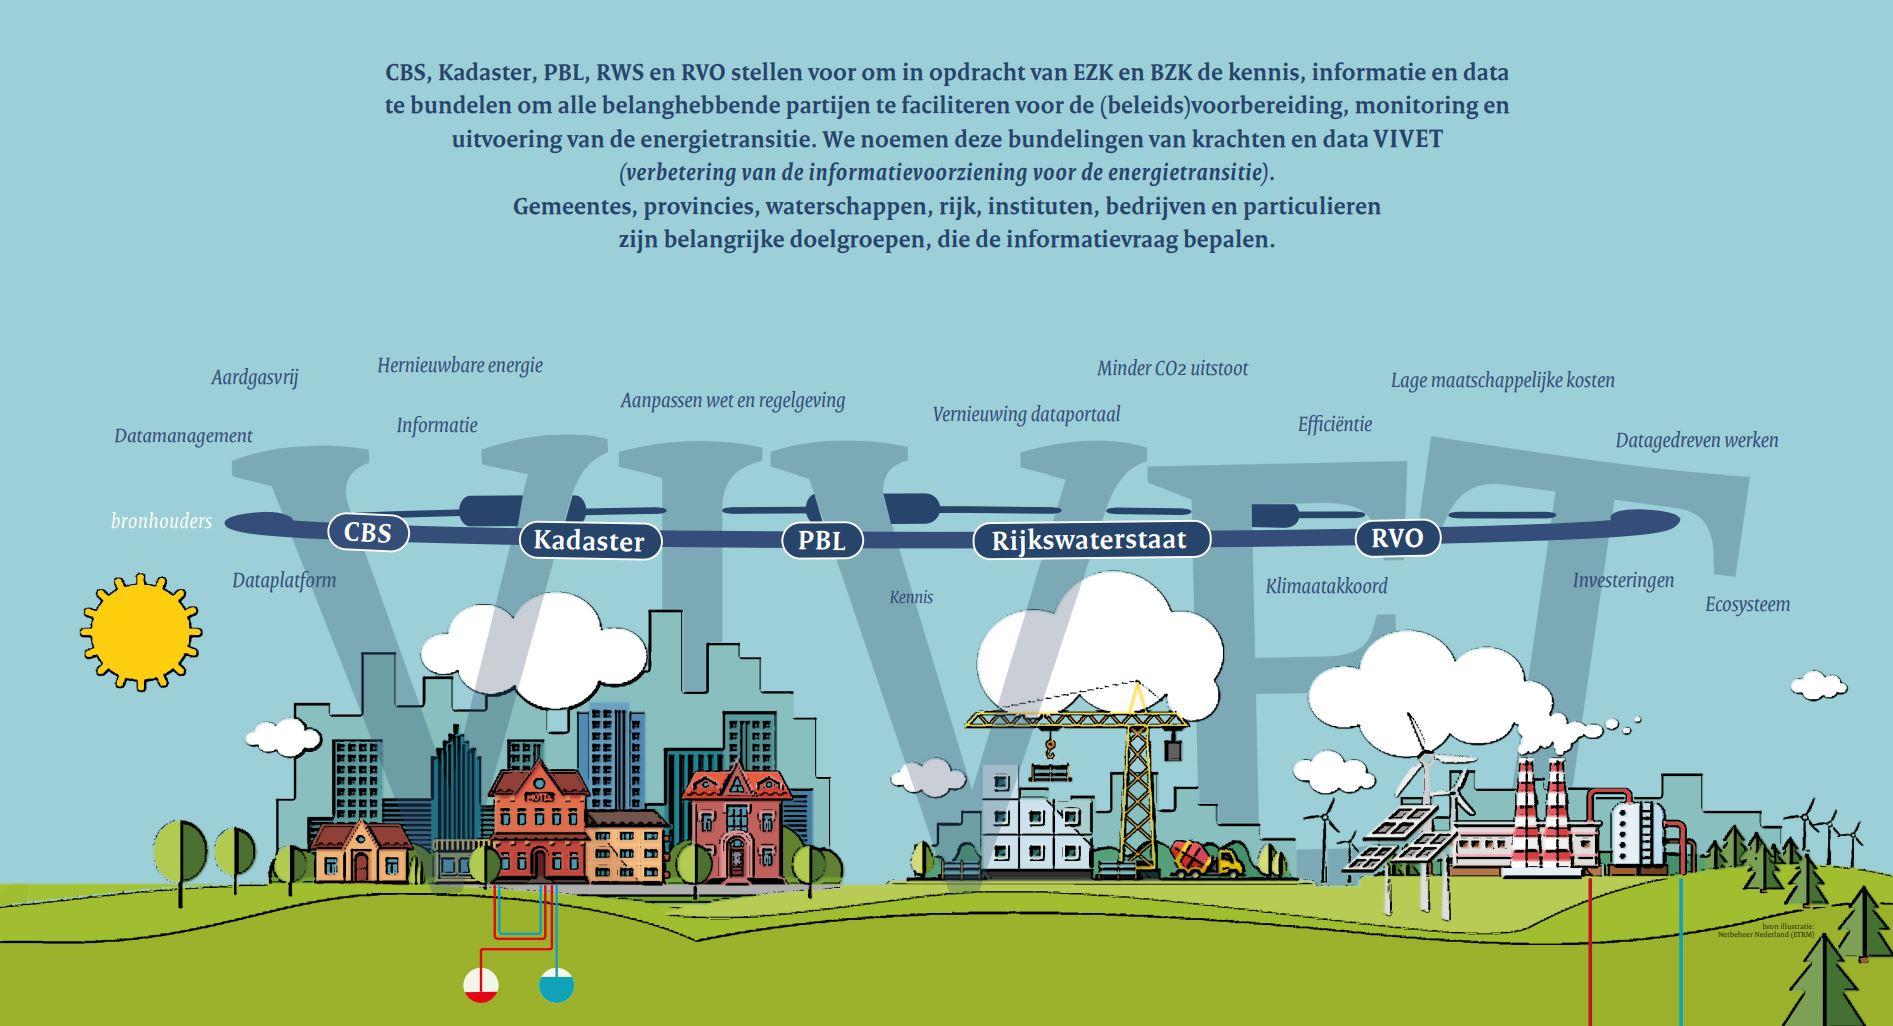 Uitsnede VIVET-poster met uitleg deelnemers en proces